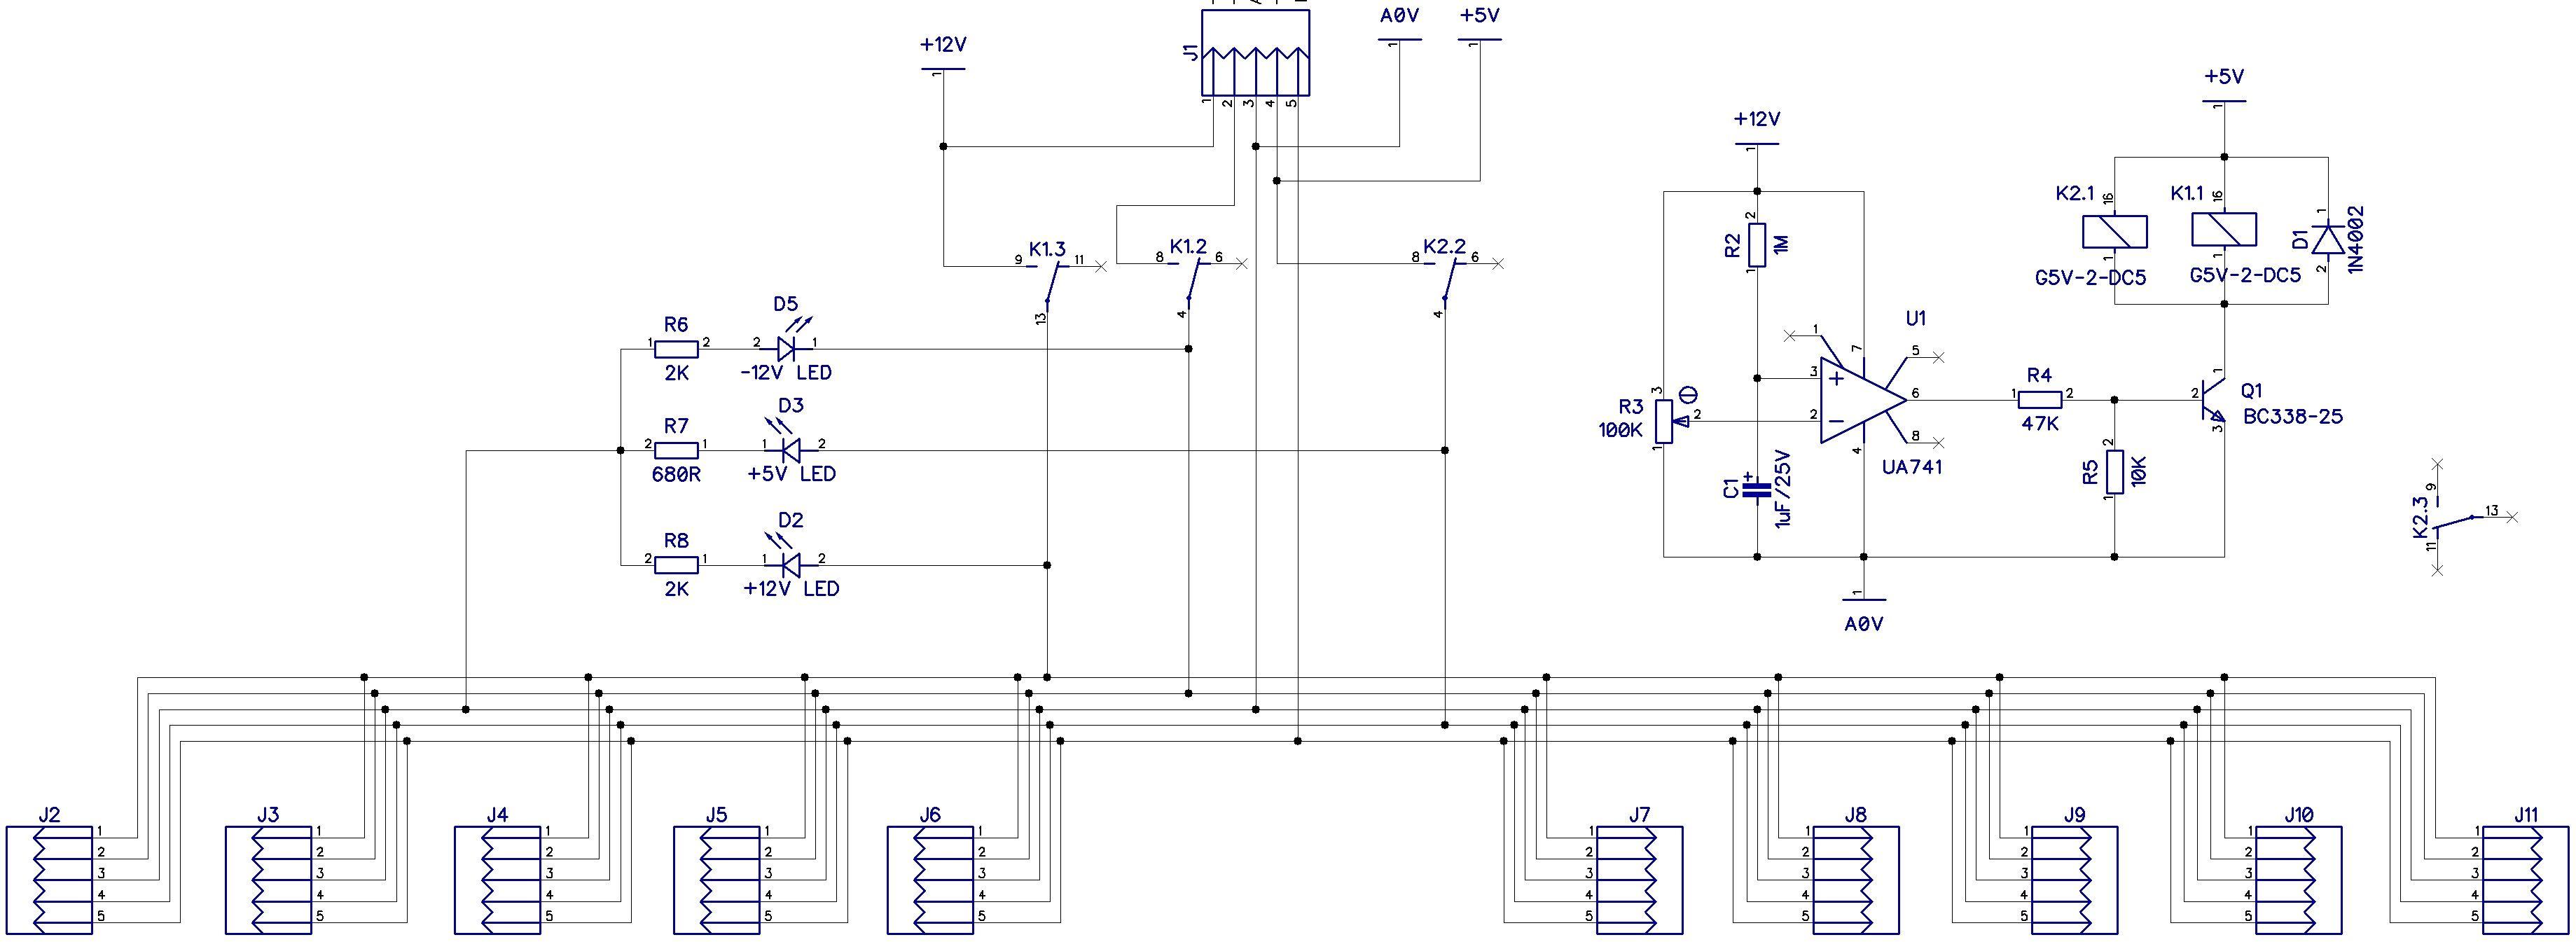 hight resolution of panel board schematic database wiring diagram panel board schematic panel board schematic